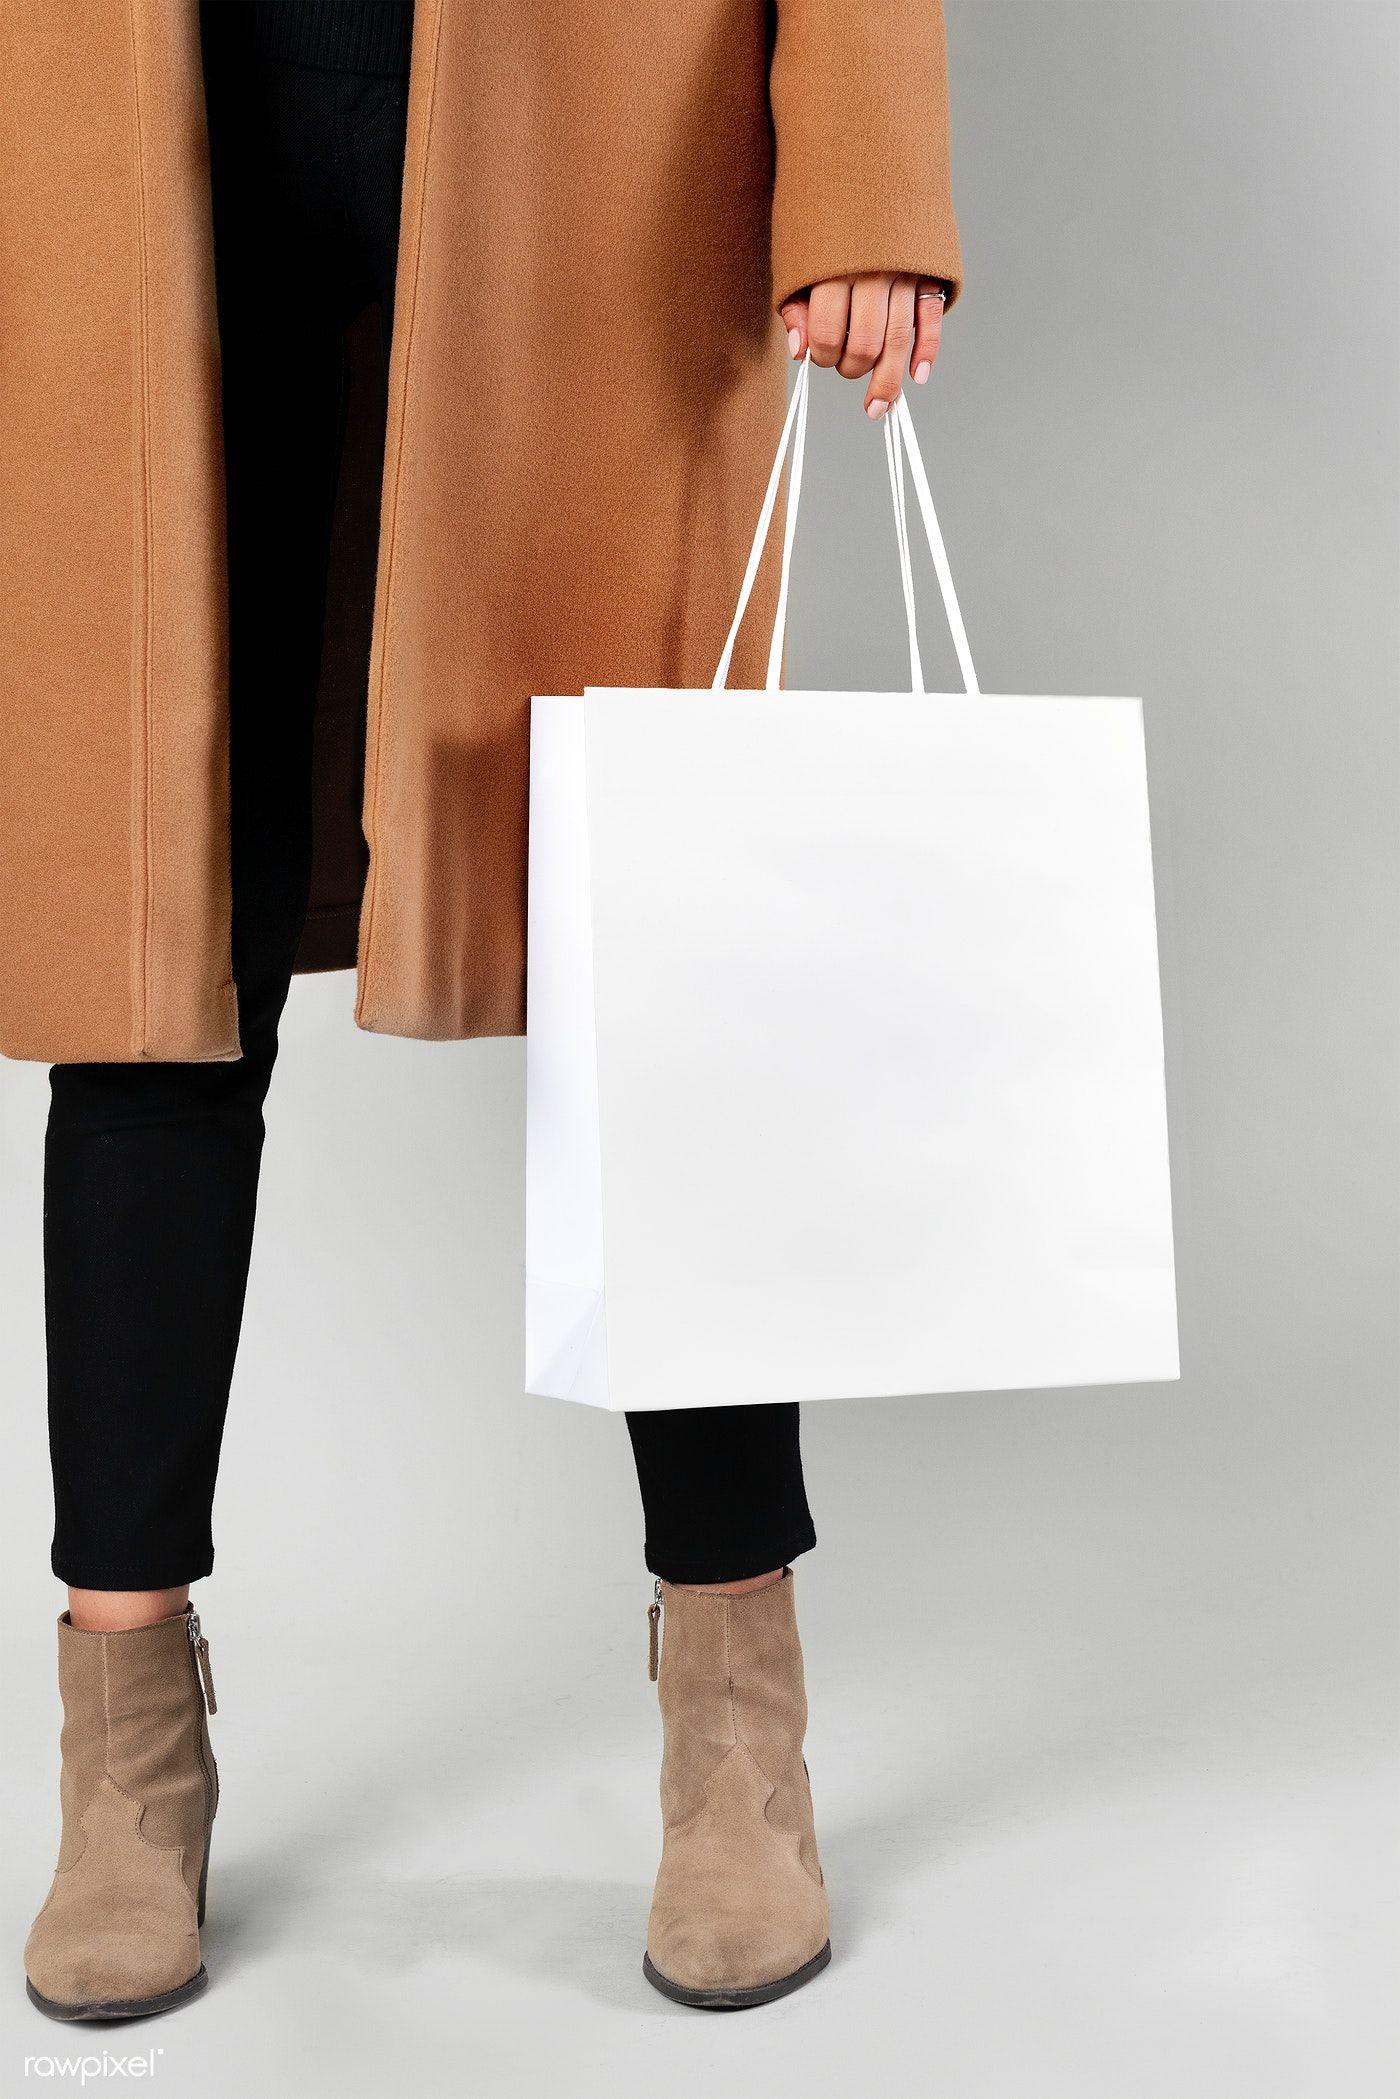 Download Download Premium Png Of Woman Carrying A Shopping Bag Mockup Transparent Bag Mockup Bags Shopping Bag